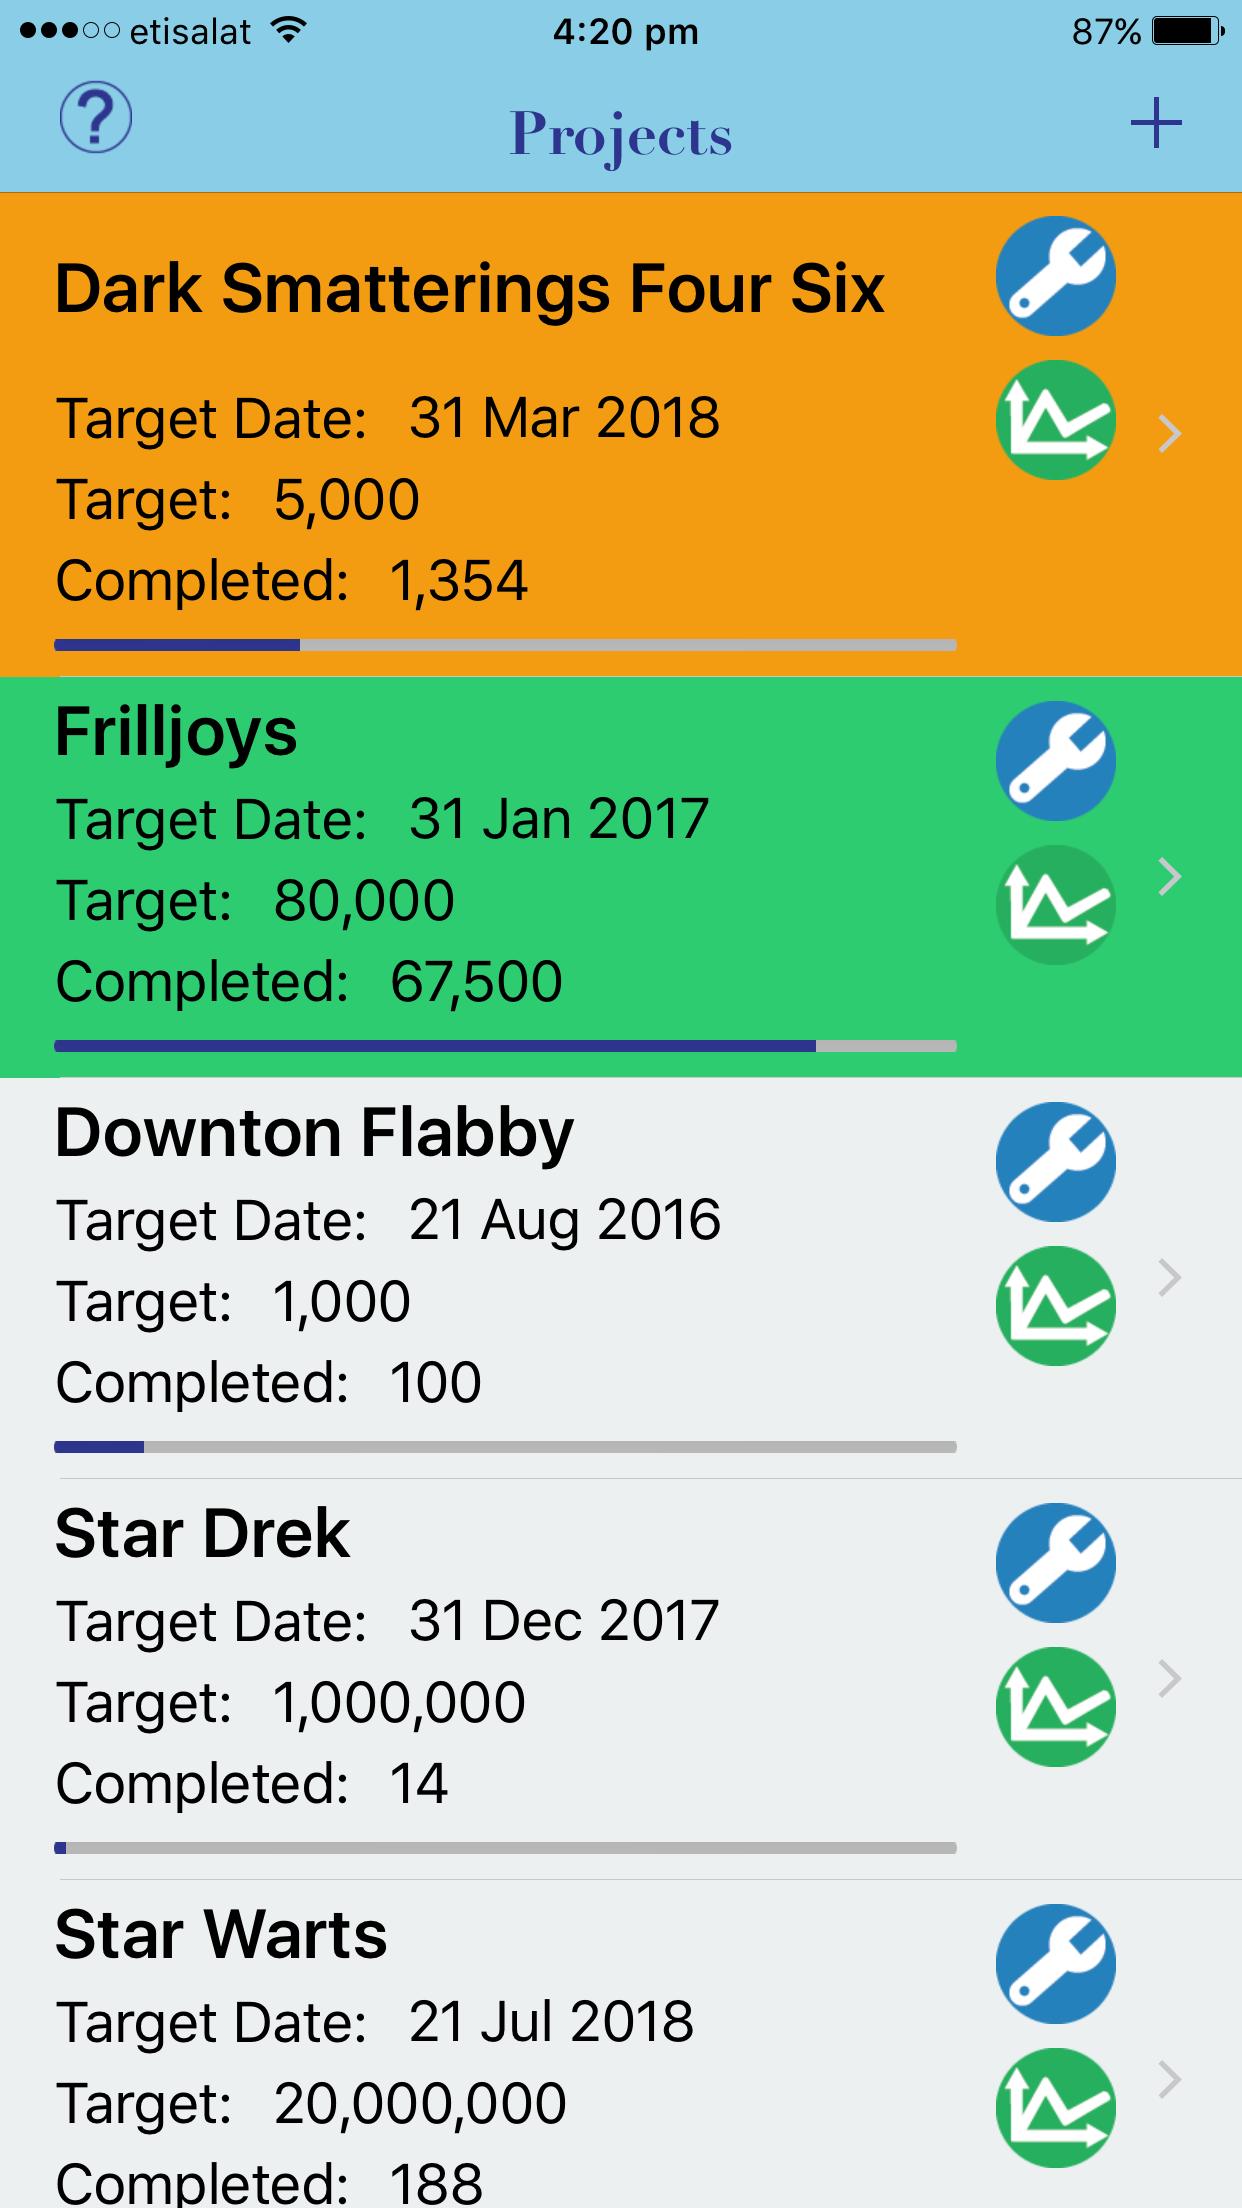 WriteOn iOS - Projects screen